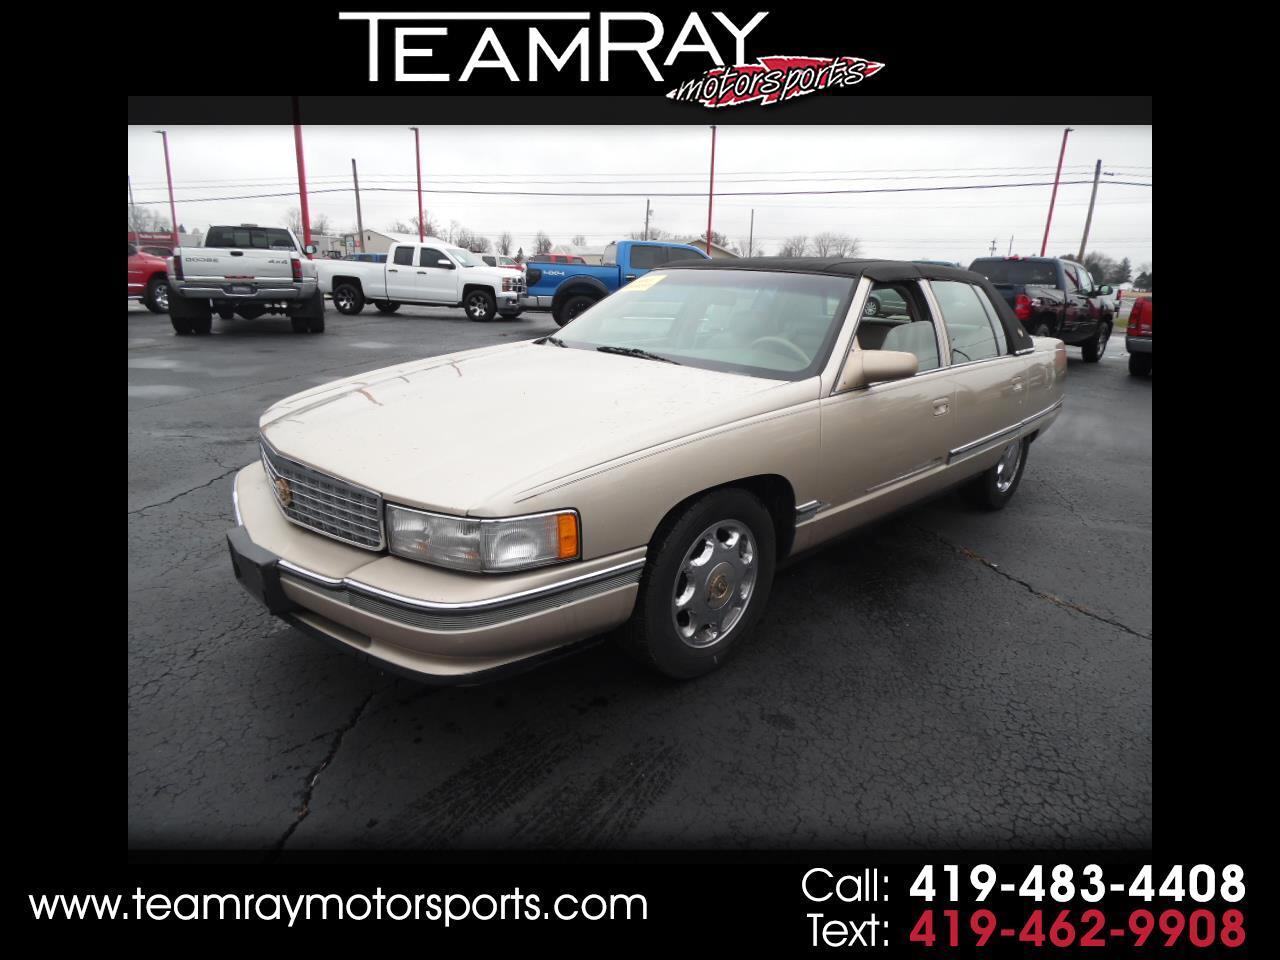 1994 Cadillac Concours 4dr Sedan